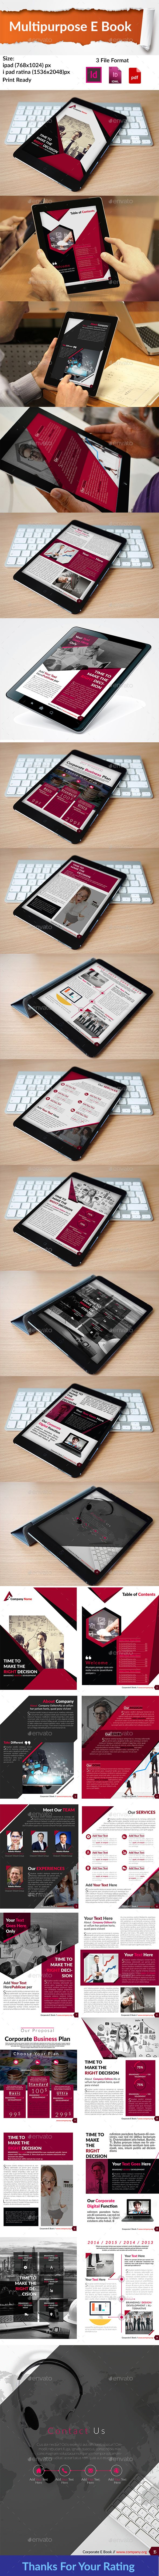 #Multipurpose E Book - Digital #Magazines #ePublishing Download here: https://graphicriver.net/item/multipurpose-e-book/19181445?ref=alena994